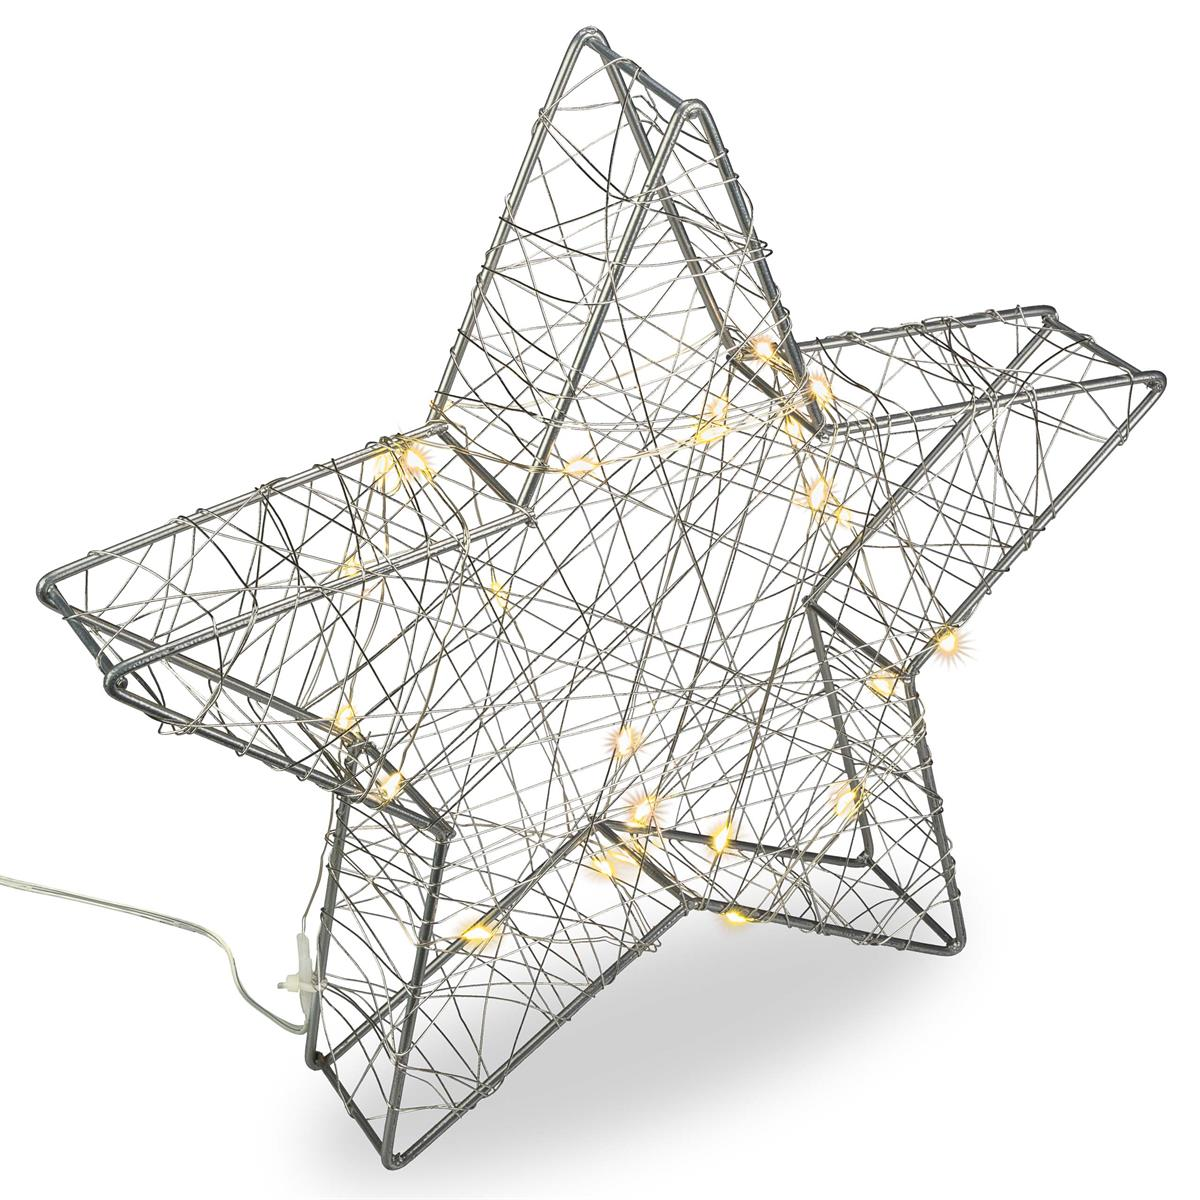 LED-Stern Dekoleuchte Metallstern 25 LED silber warm weiß Batterie Timer 30 cm